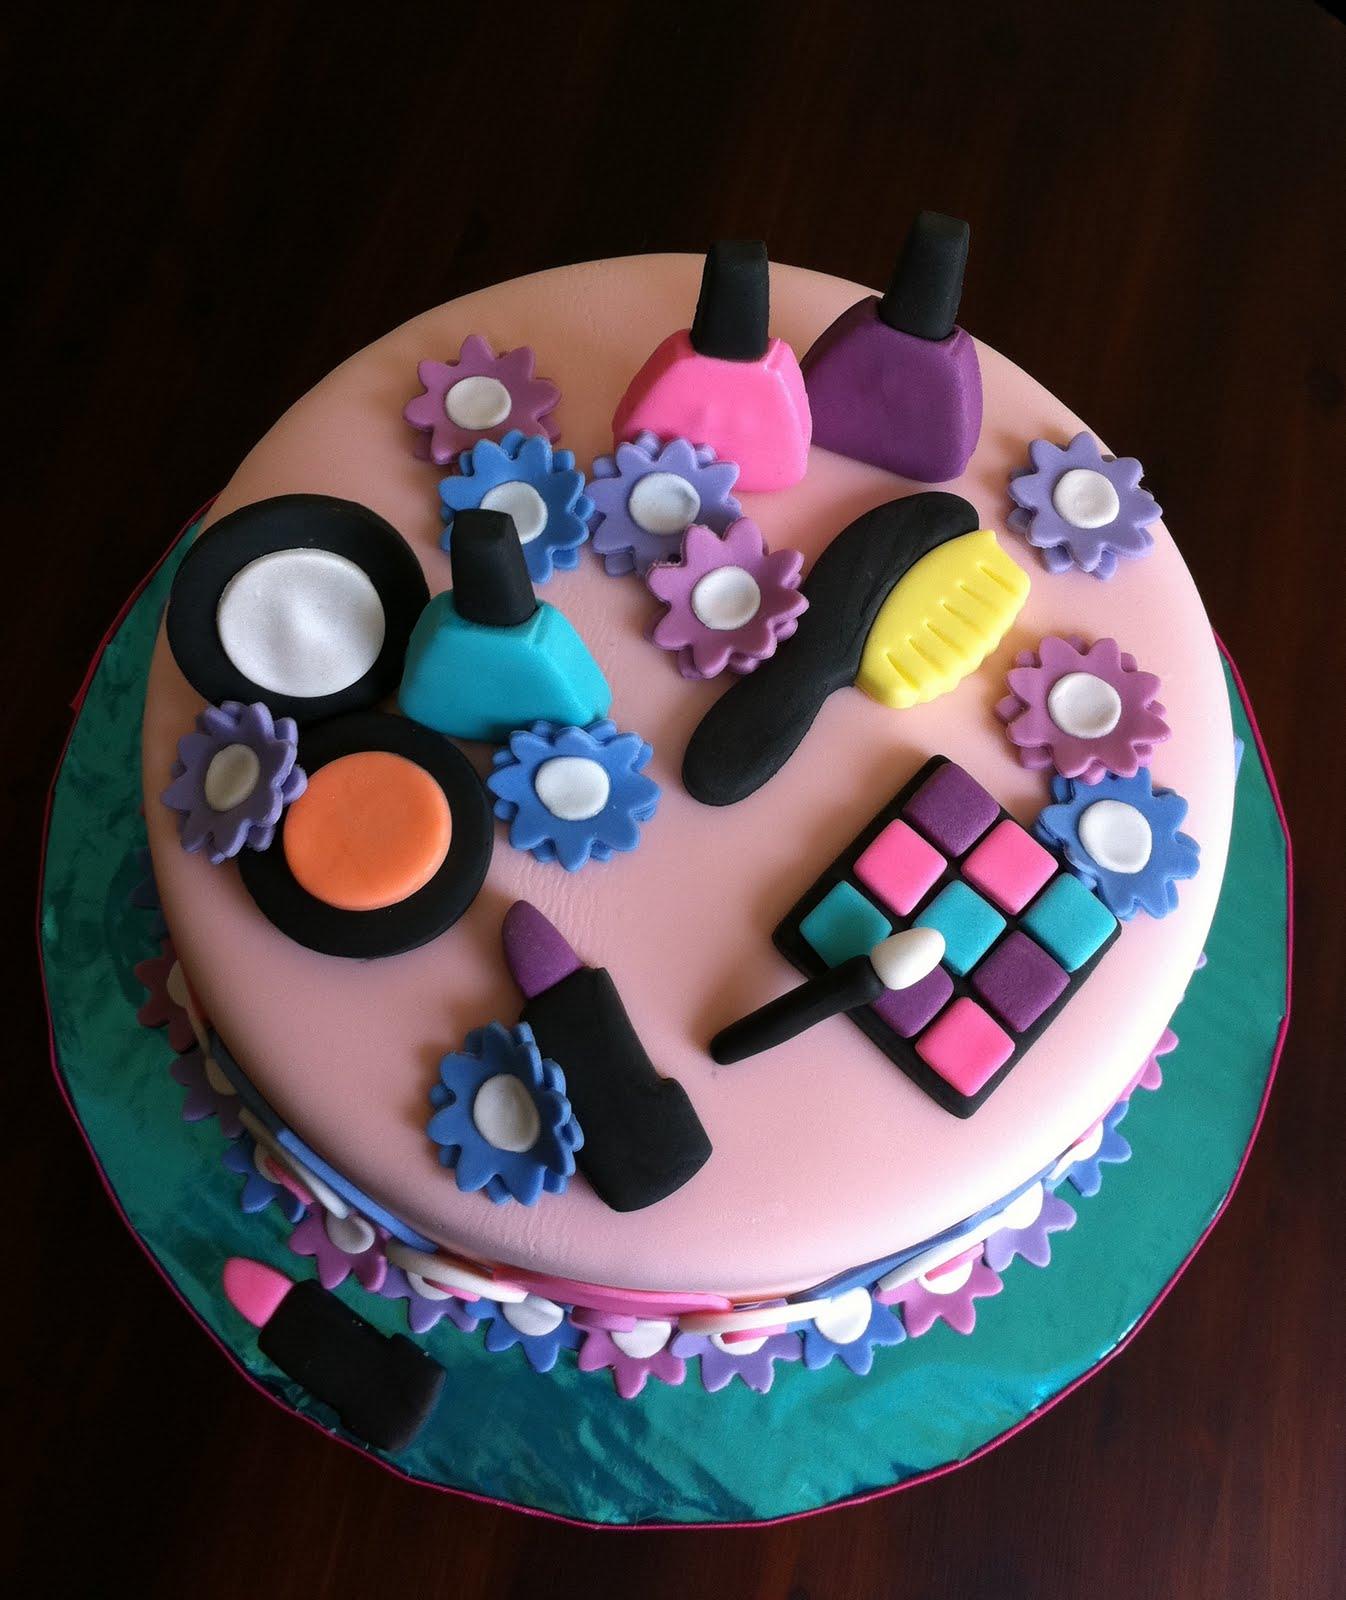 Lavender Sugar Cakes By Jessica Data Spa Themed Birthday Cake